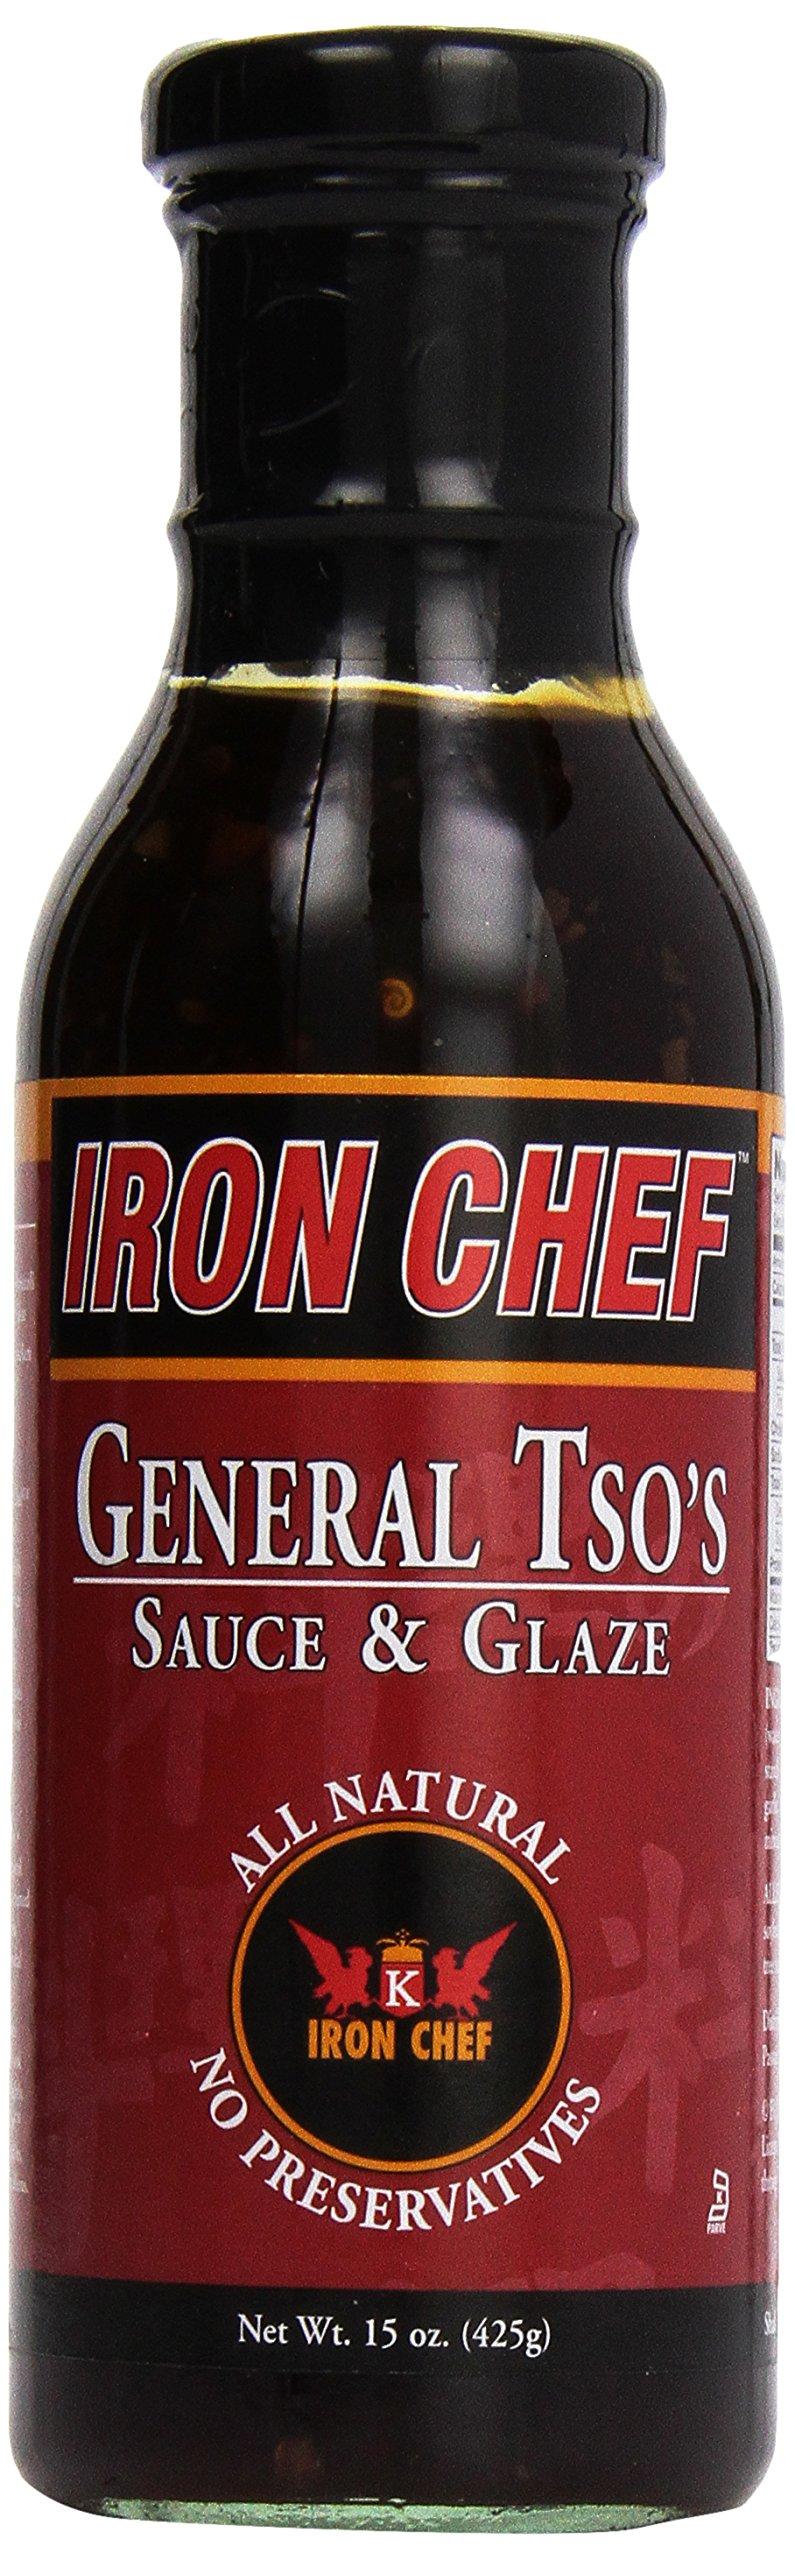 Iron Chef General Tso's Sauce, 15 oz